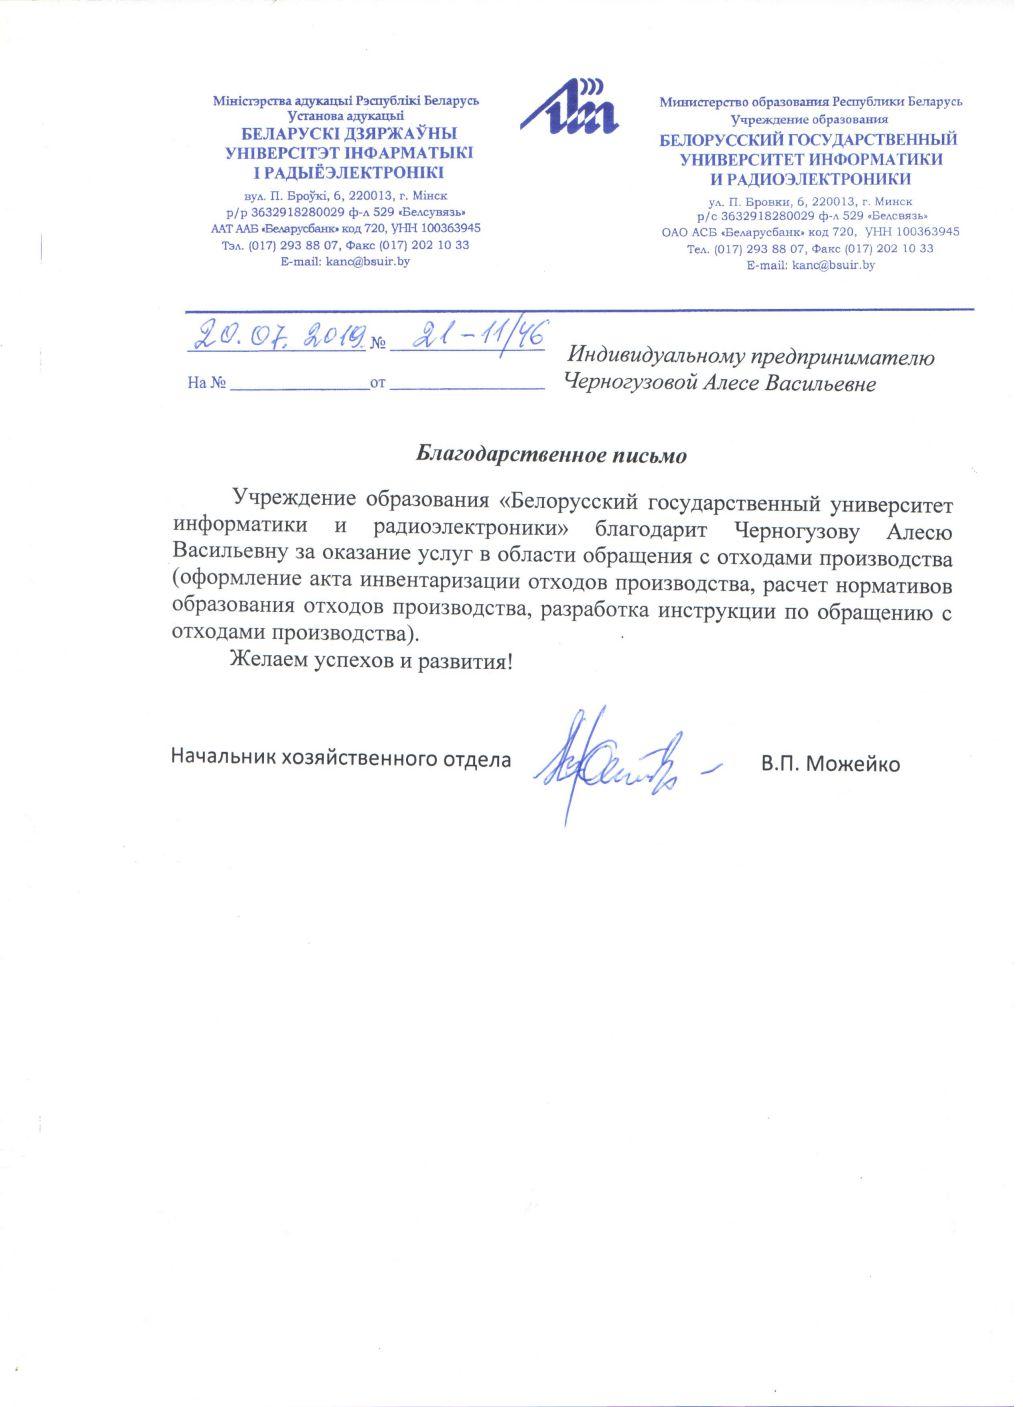 БГУИР отзыв об экологе Алесе